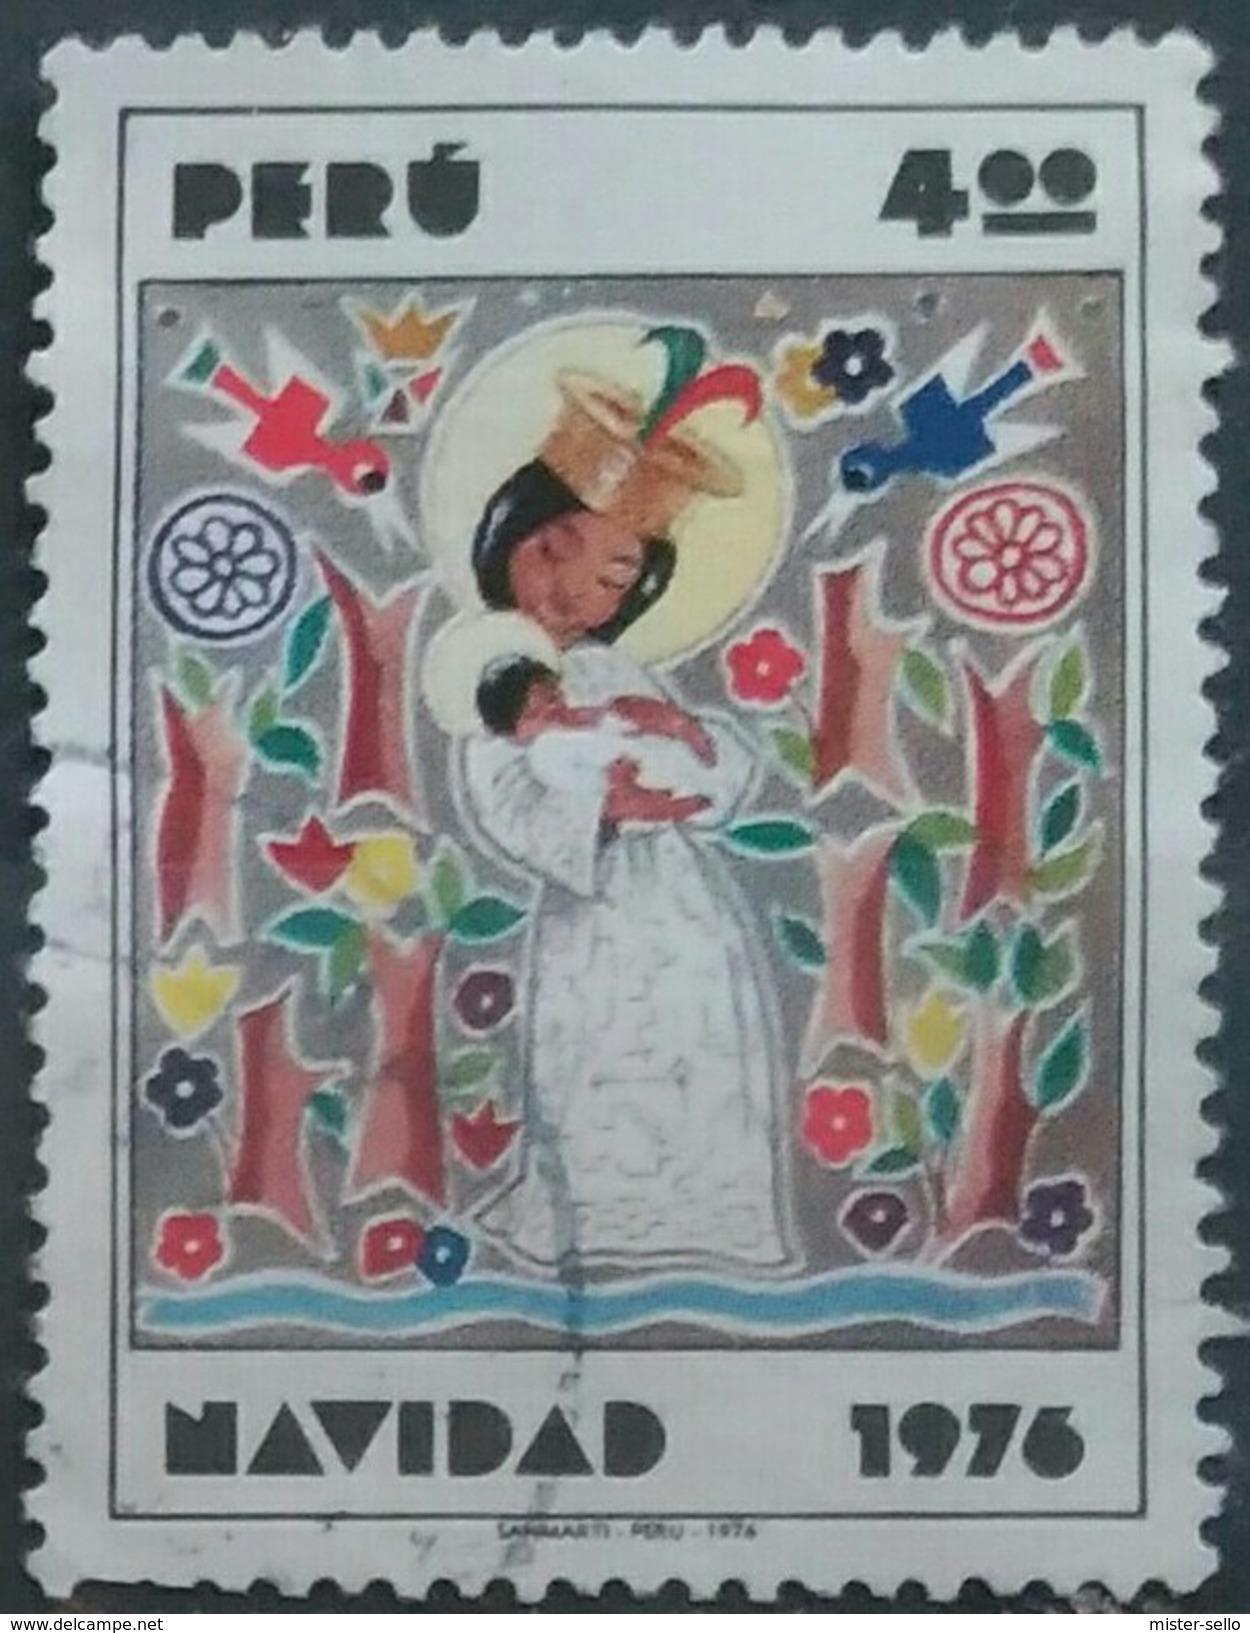 PERÚ 1976 Navidad. USADO - USED. - Peru